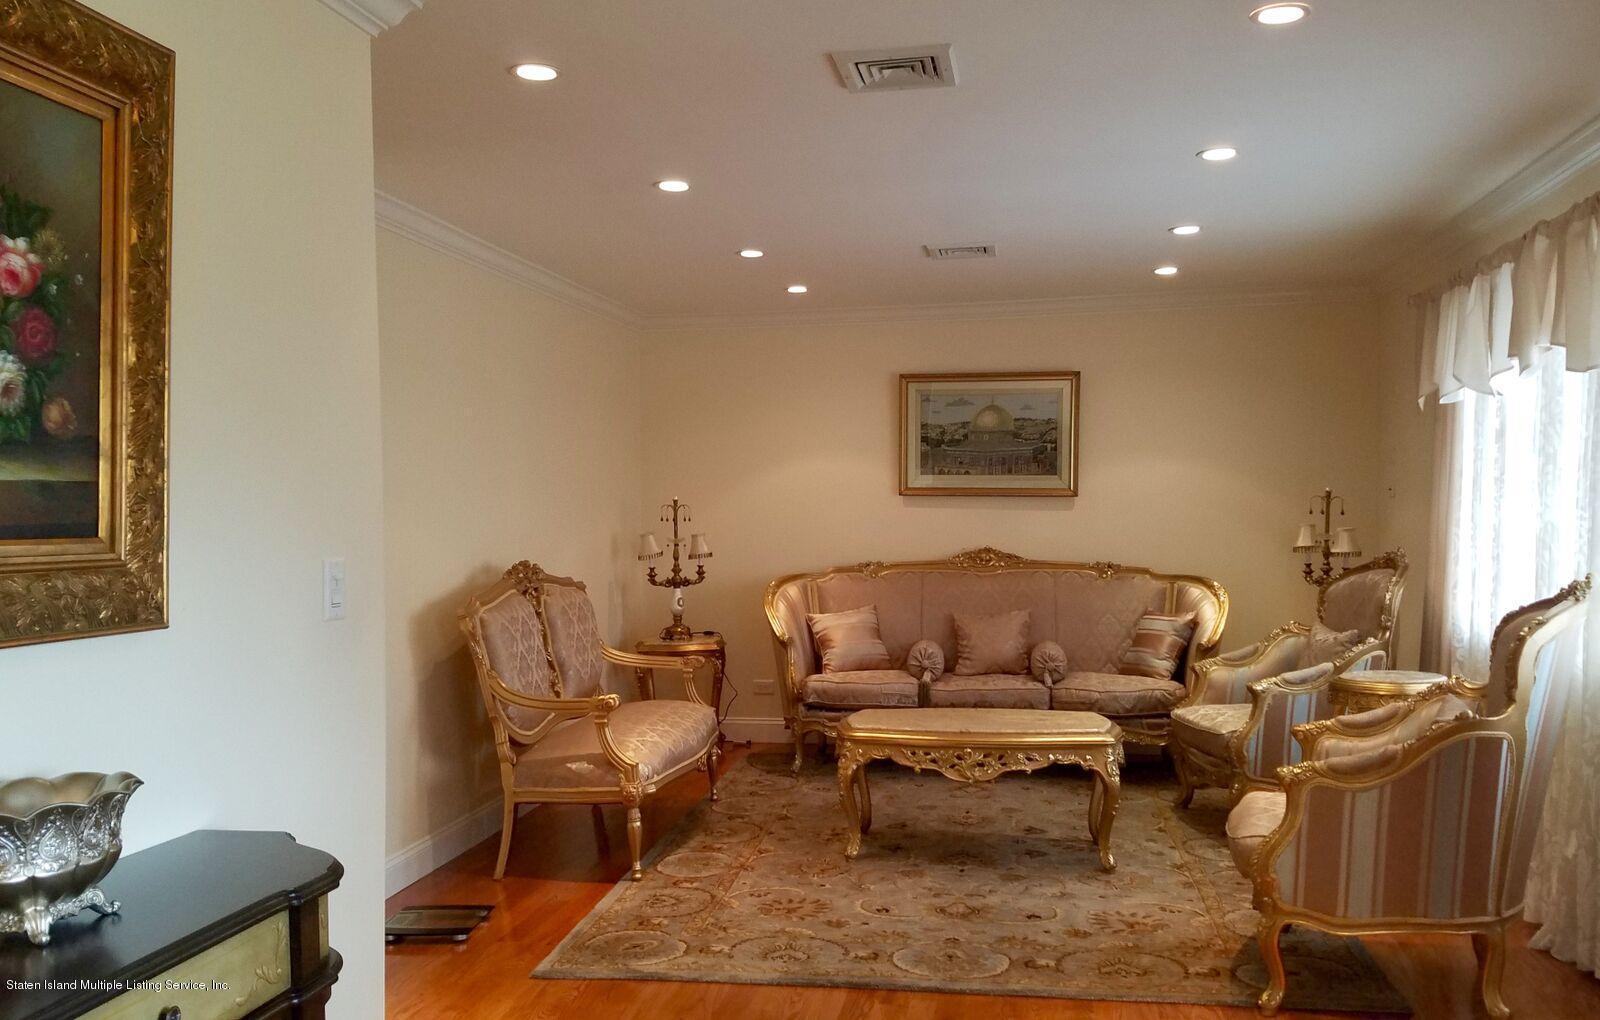 Single Family - Detached 104 Dutchess Ave   Staten Island, NY 10304, MLS-1113043-2